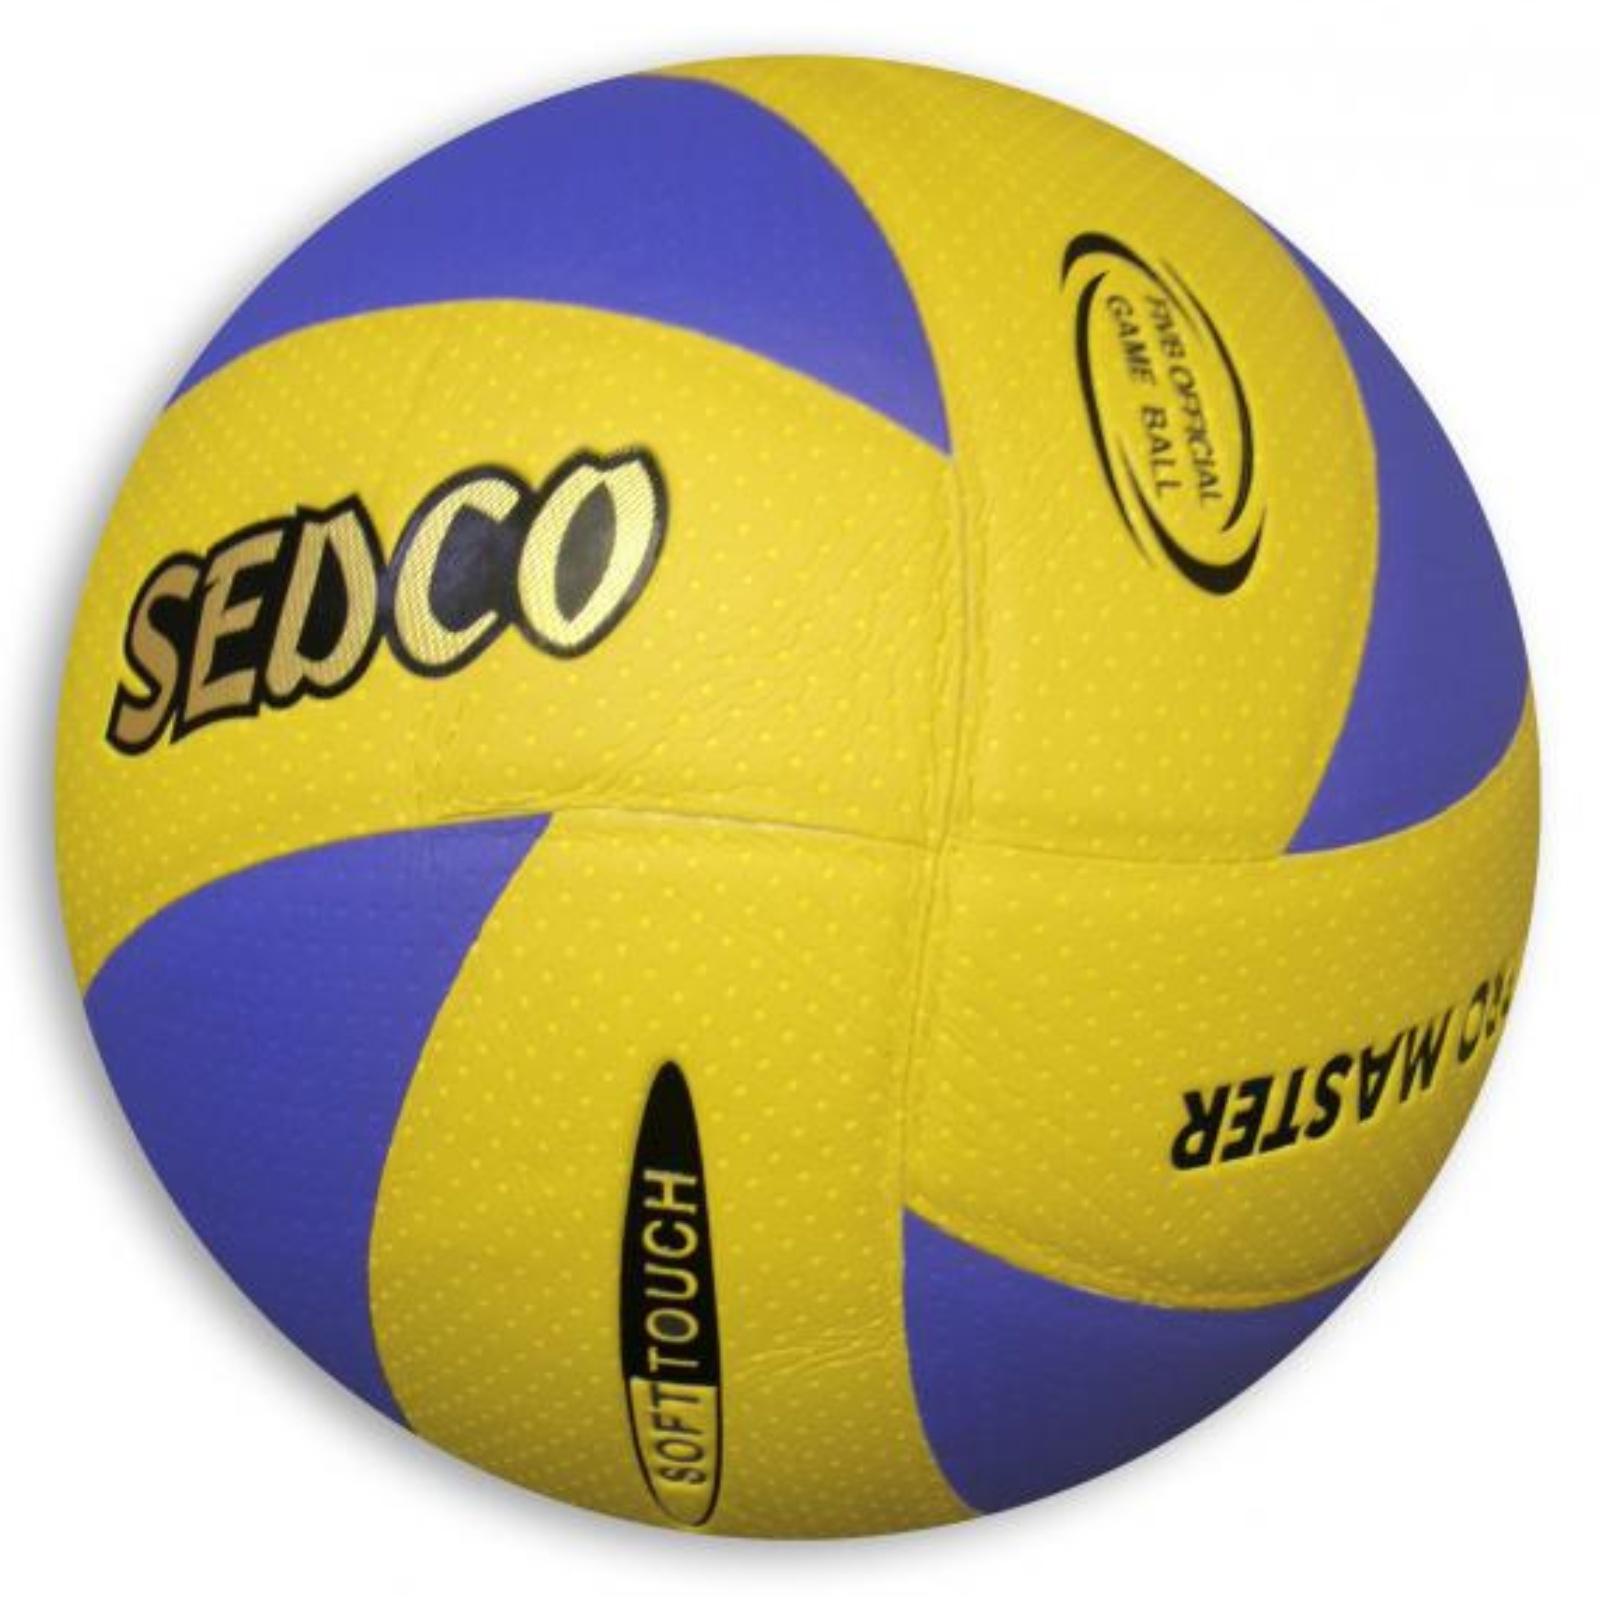 Volejbalový míč SEDCO Pro Master